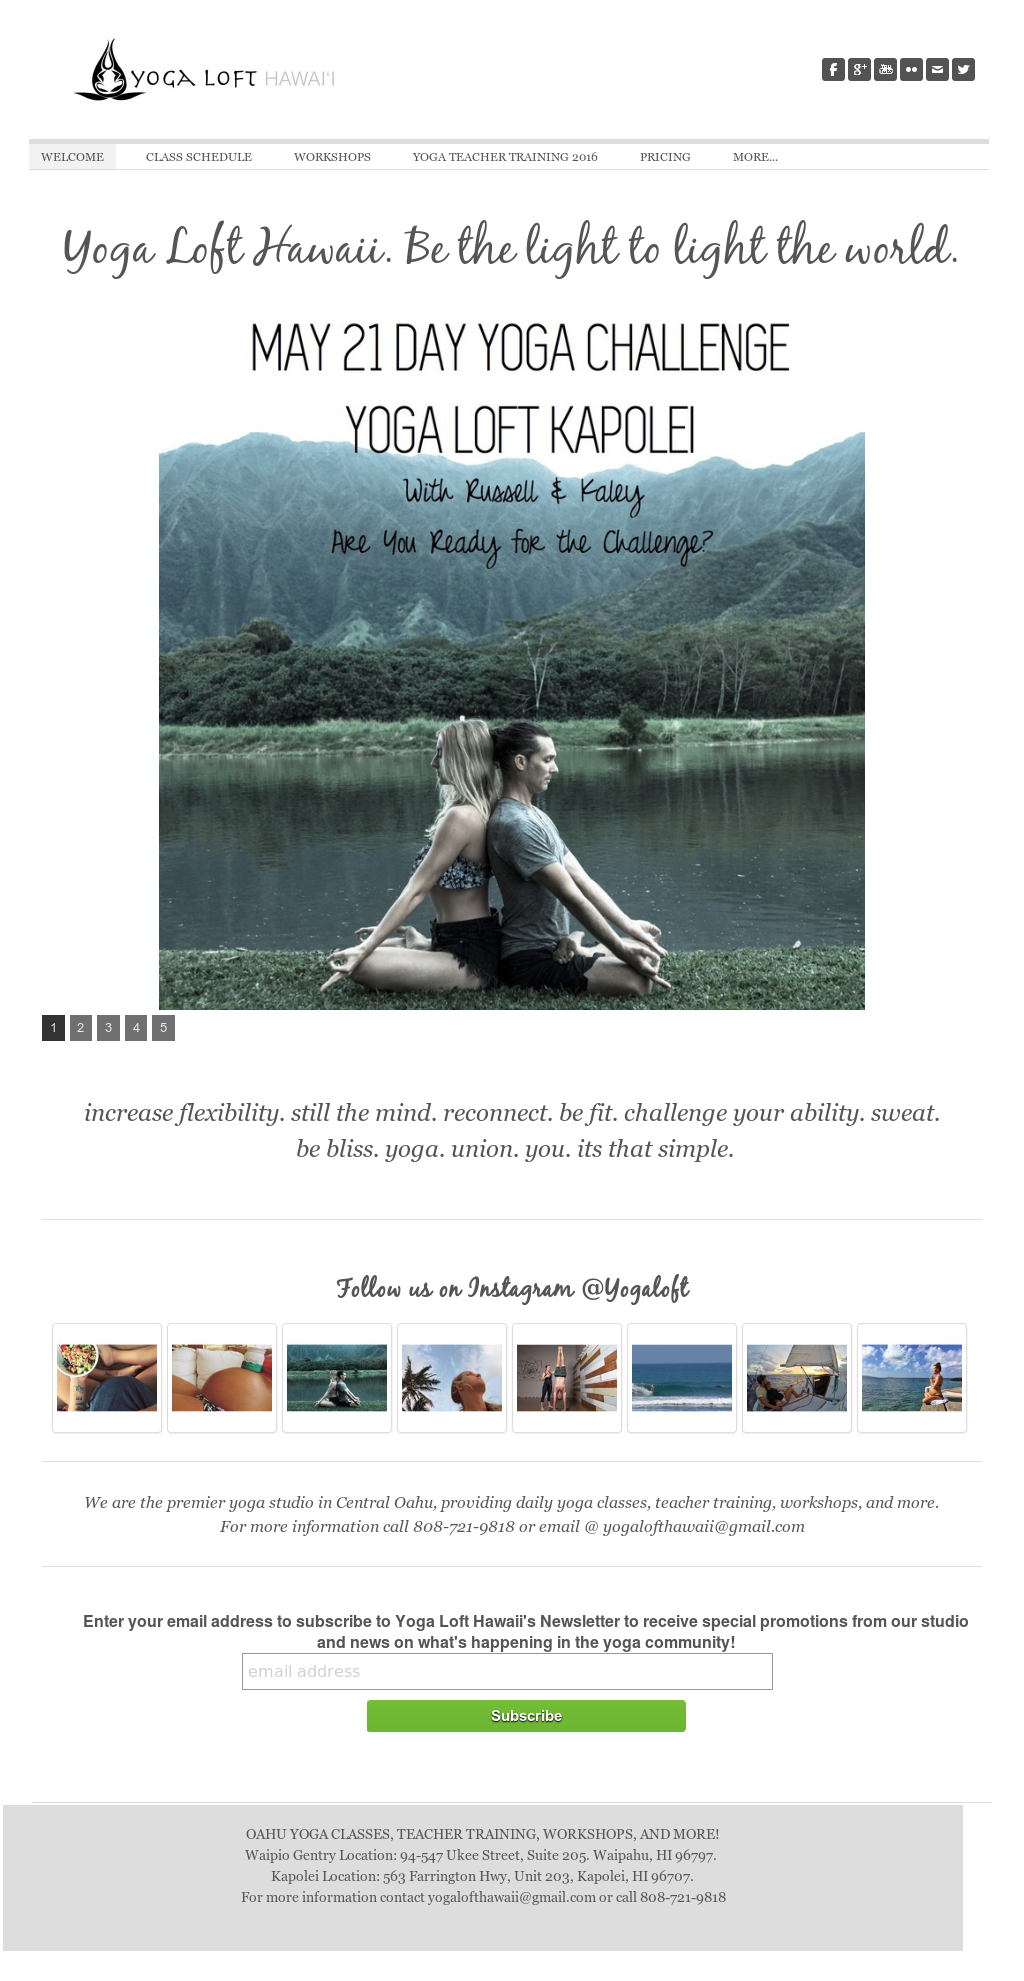 f4a8db46fa2c8 Yoga Loft Hawaii Competitors, Revenue and Employees - Owler Company Profile